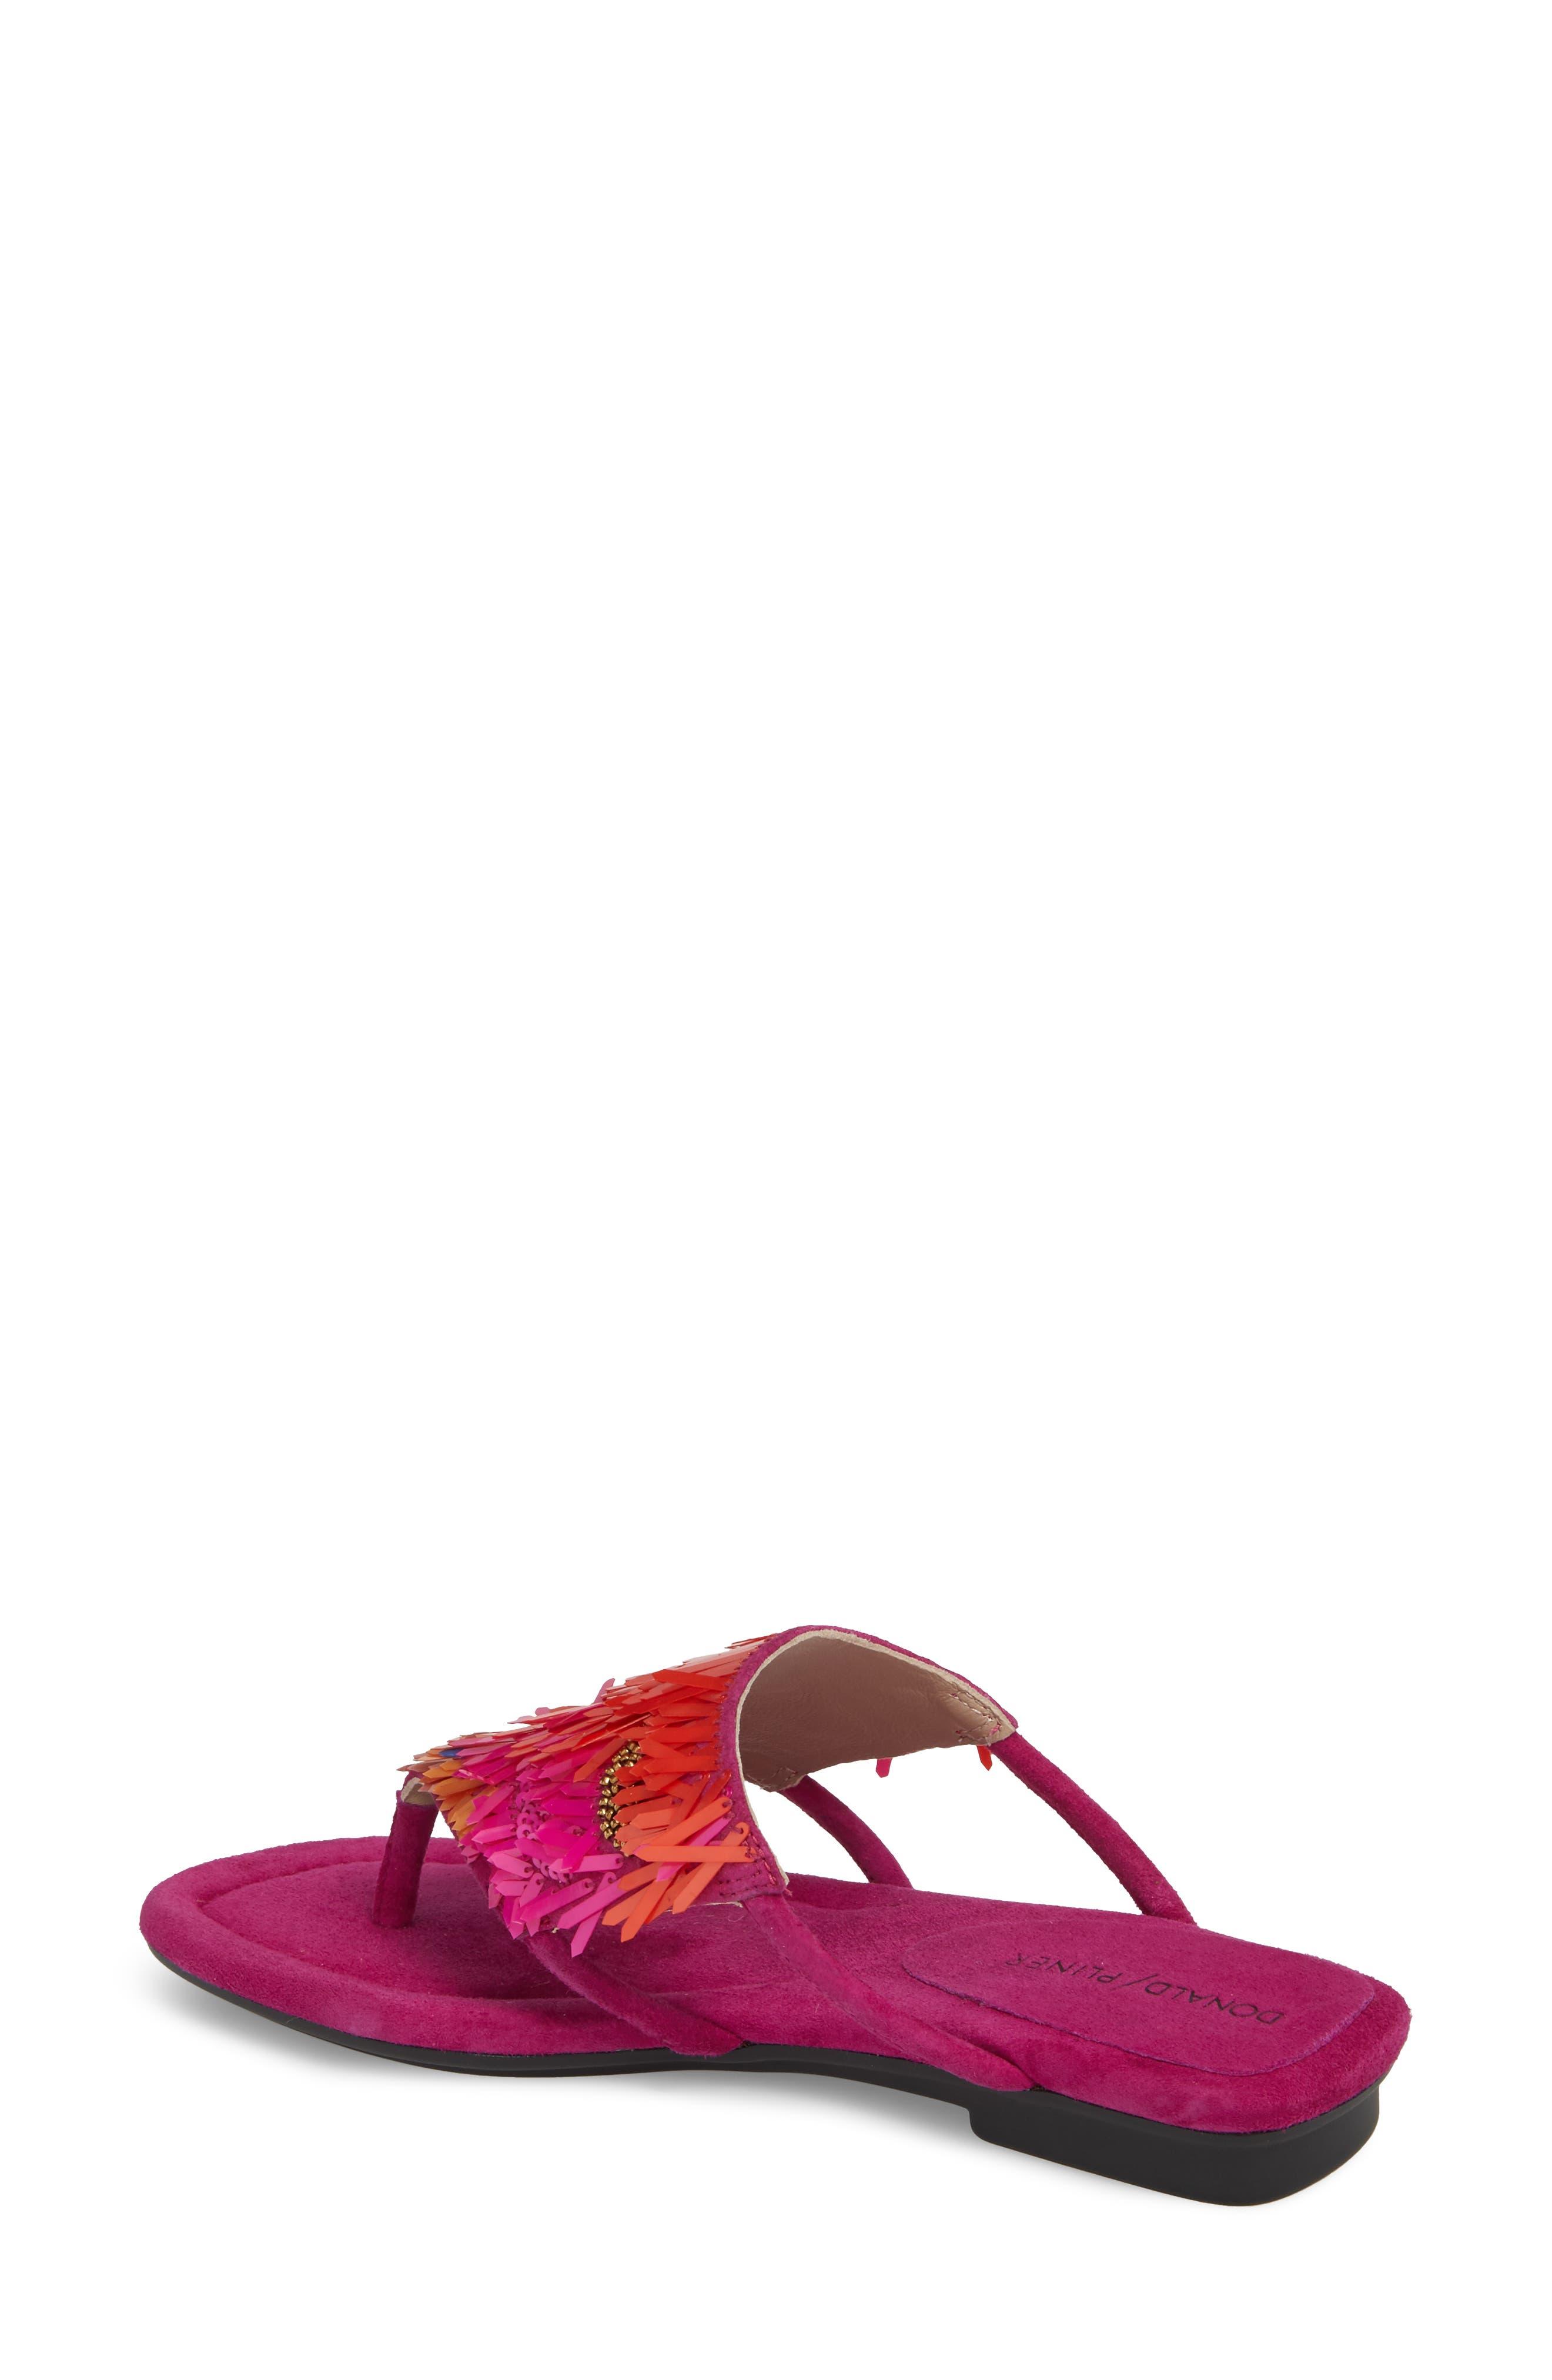 Kya Feather Sequin Sandal,                             Alternate thumbnail 4, color,